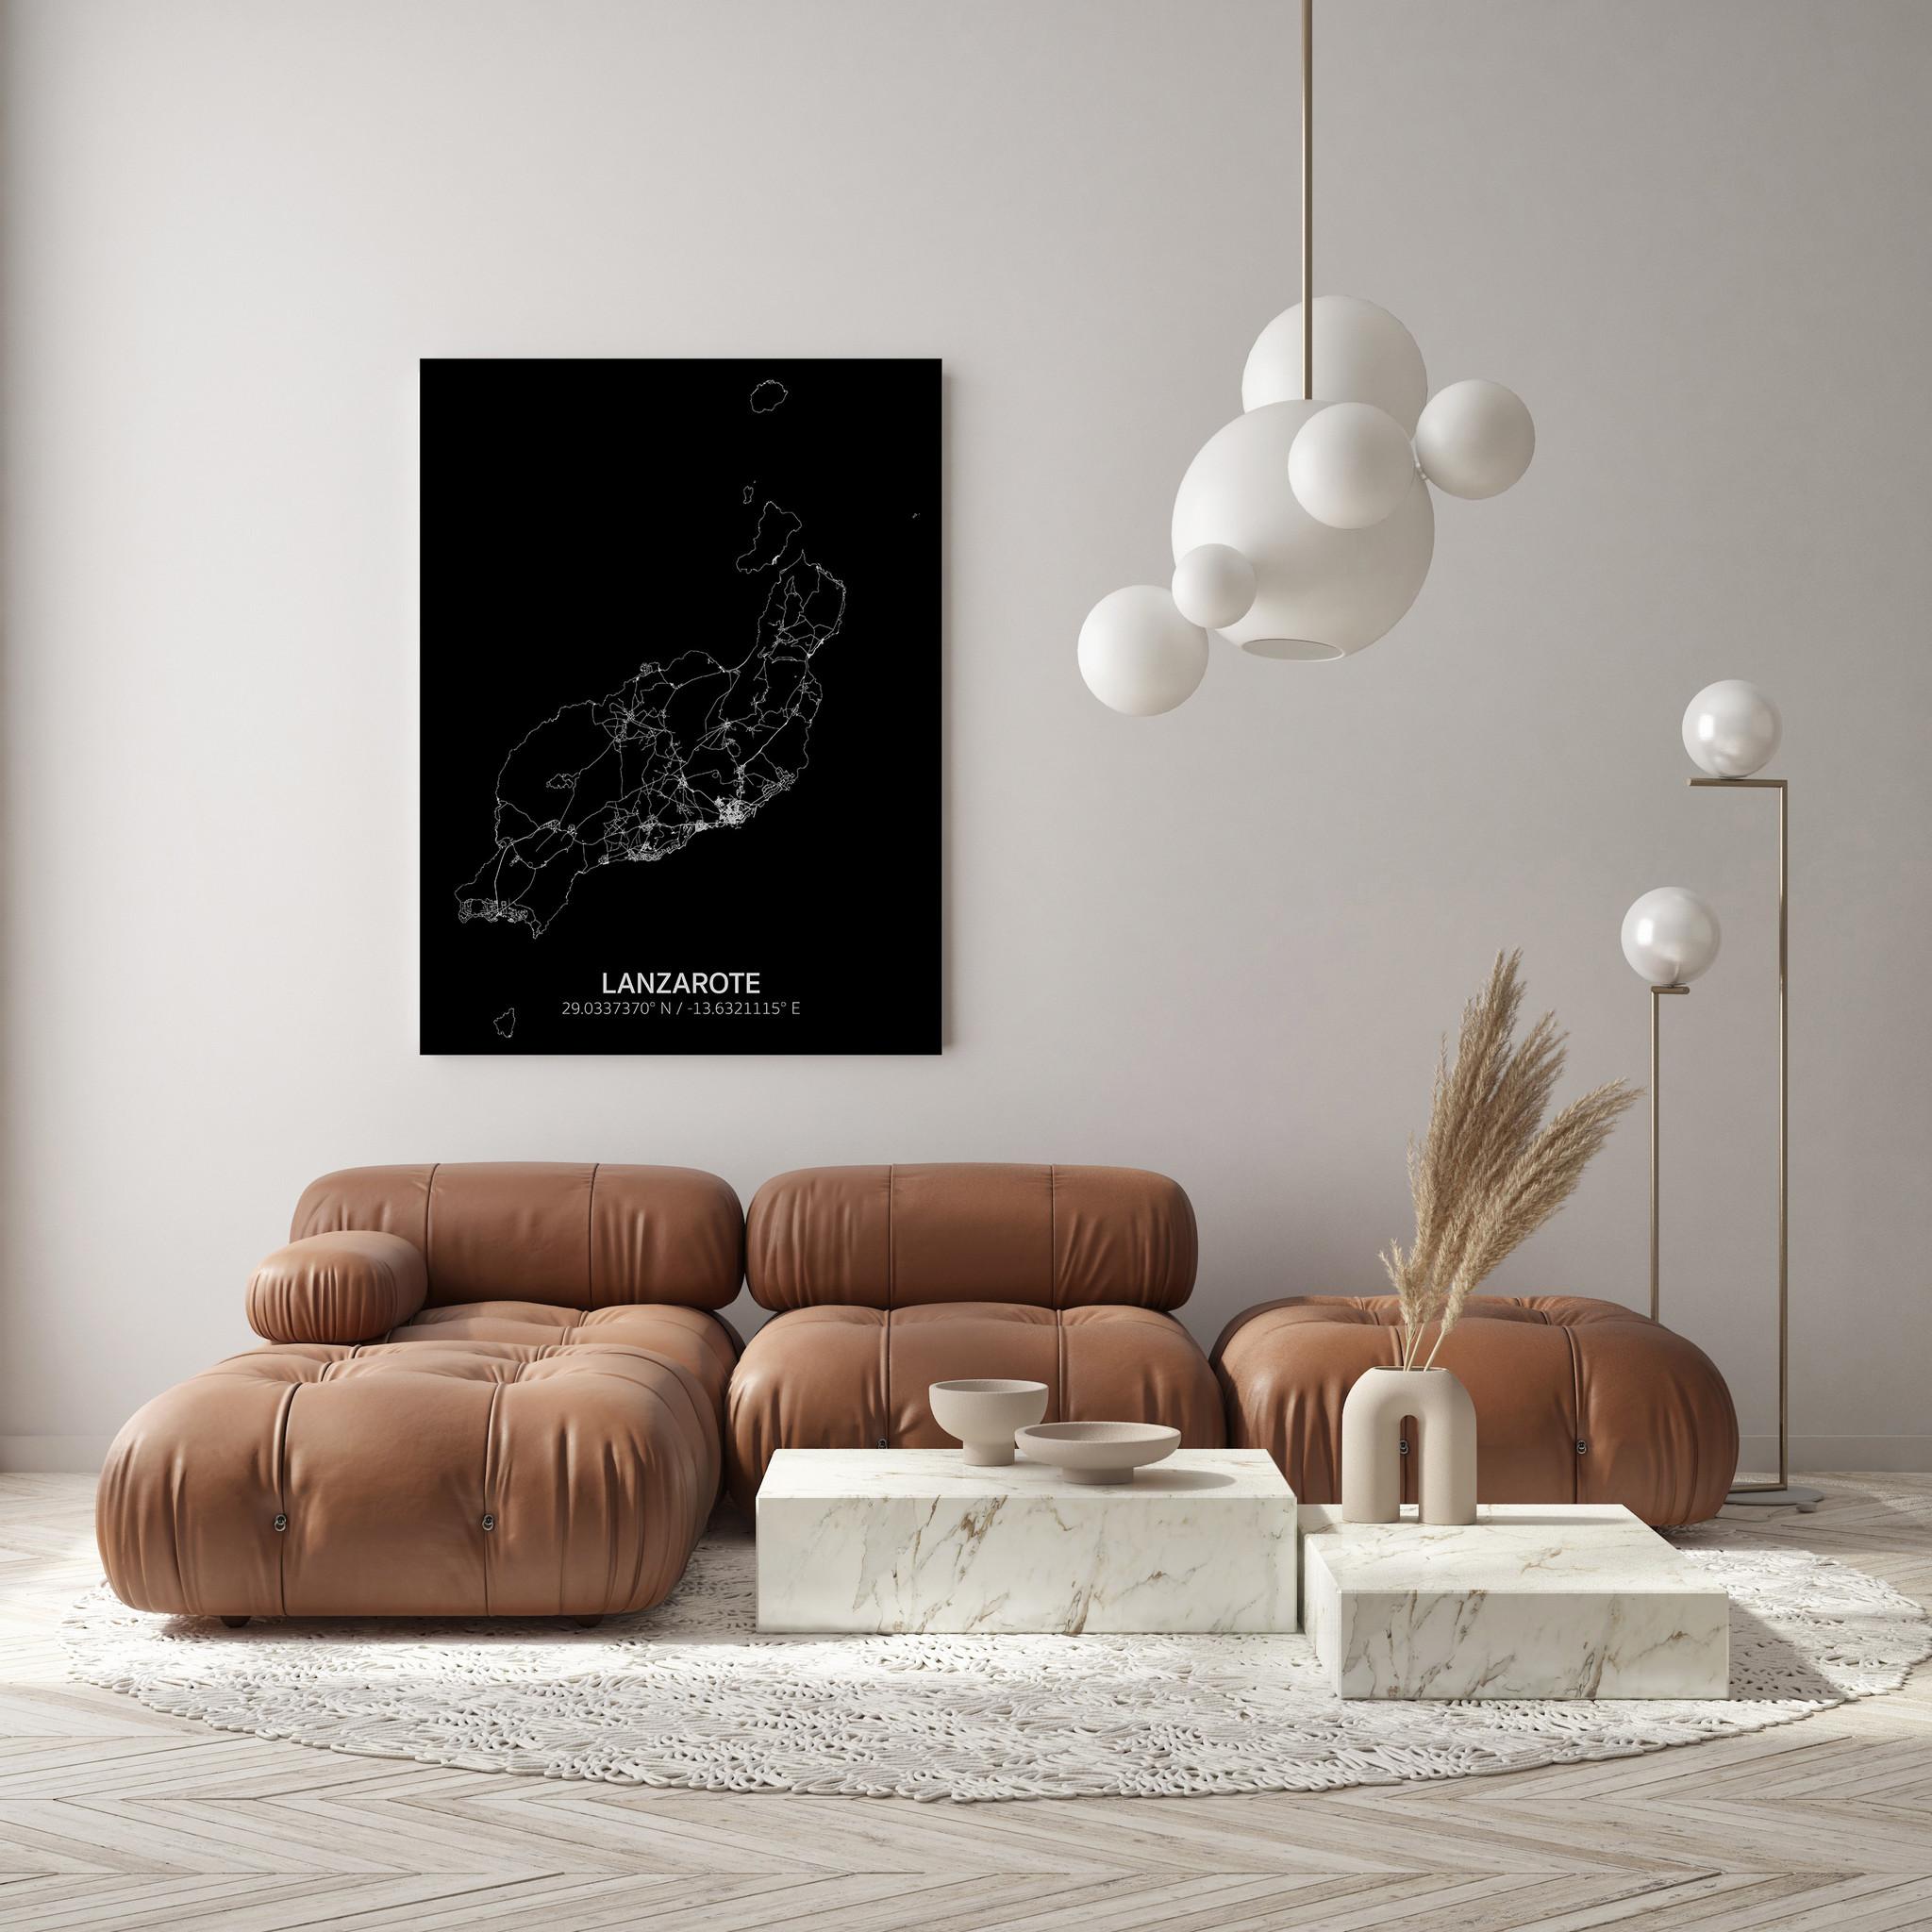 Stadtkarte Lanzarote | Aluminium Wanddekoration-2